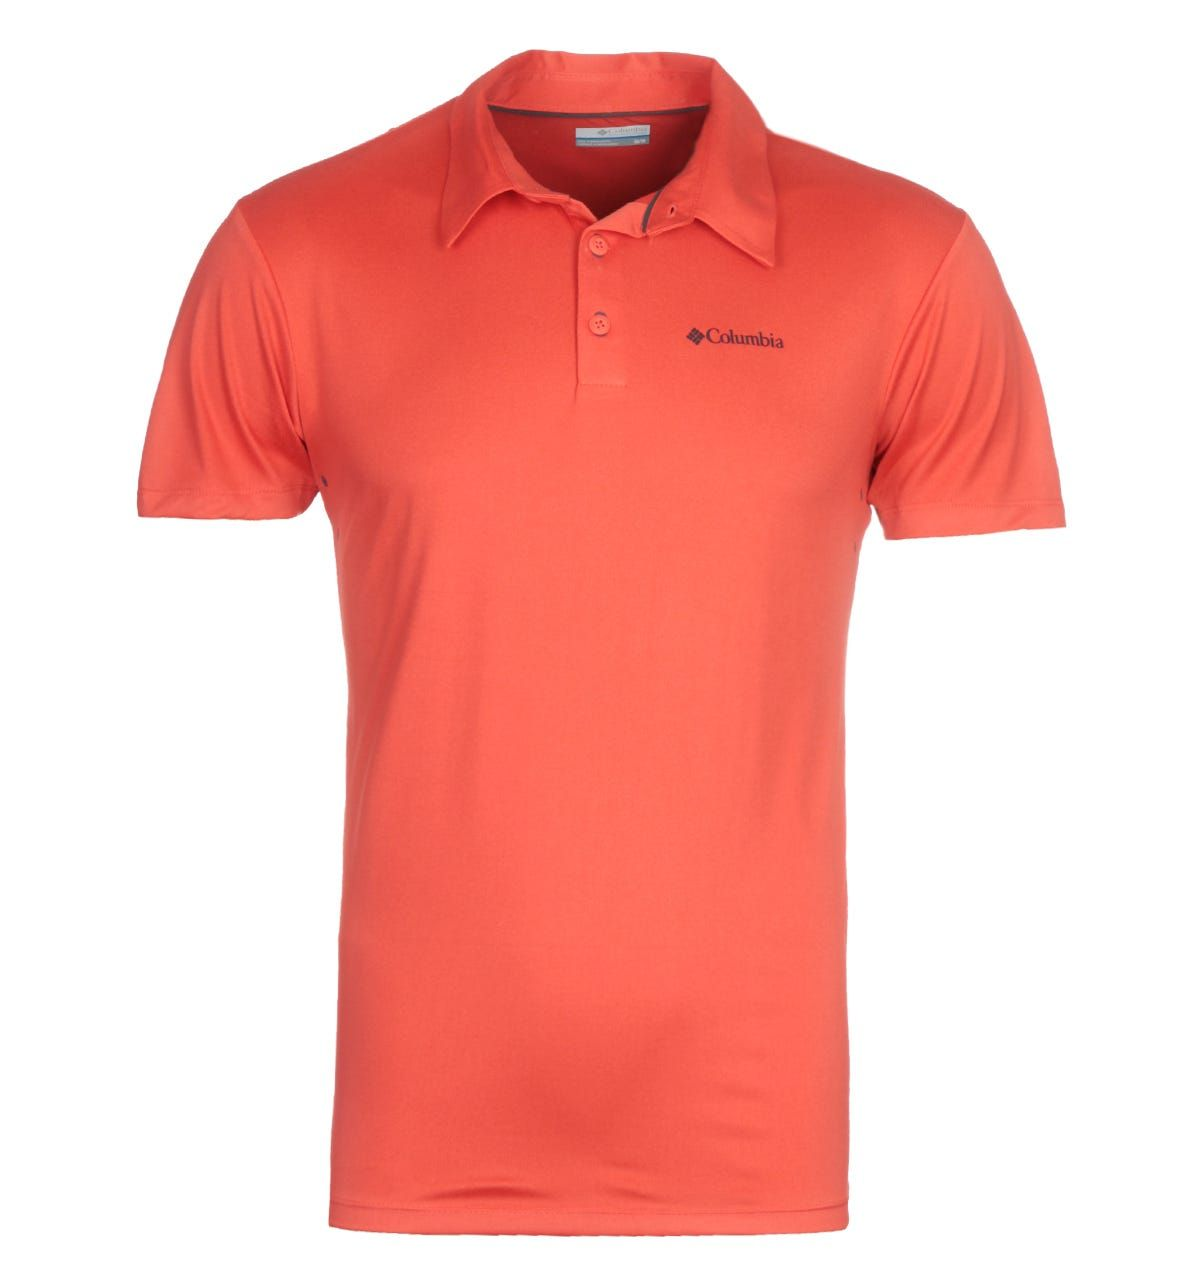 Columbia Triple Canyon Red Tech Polo Shirt